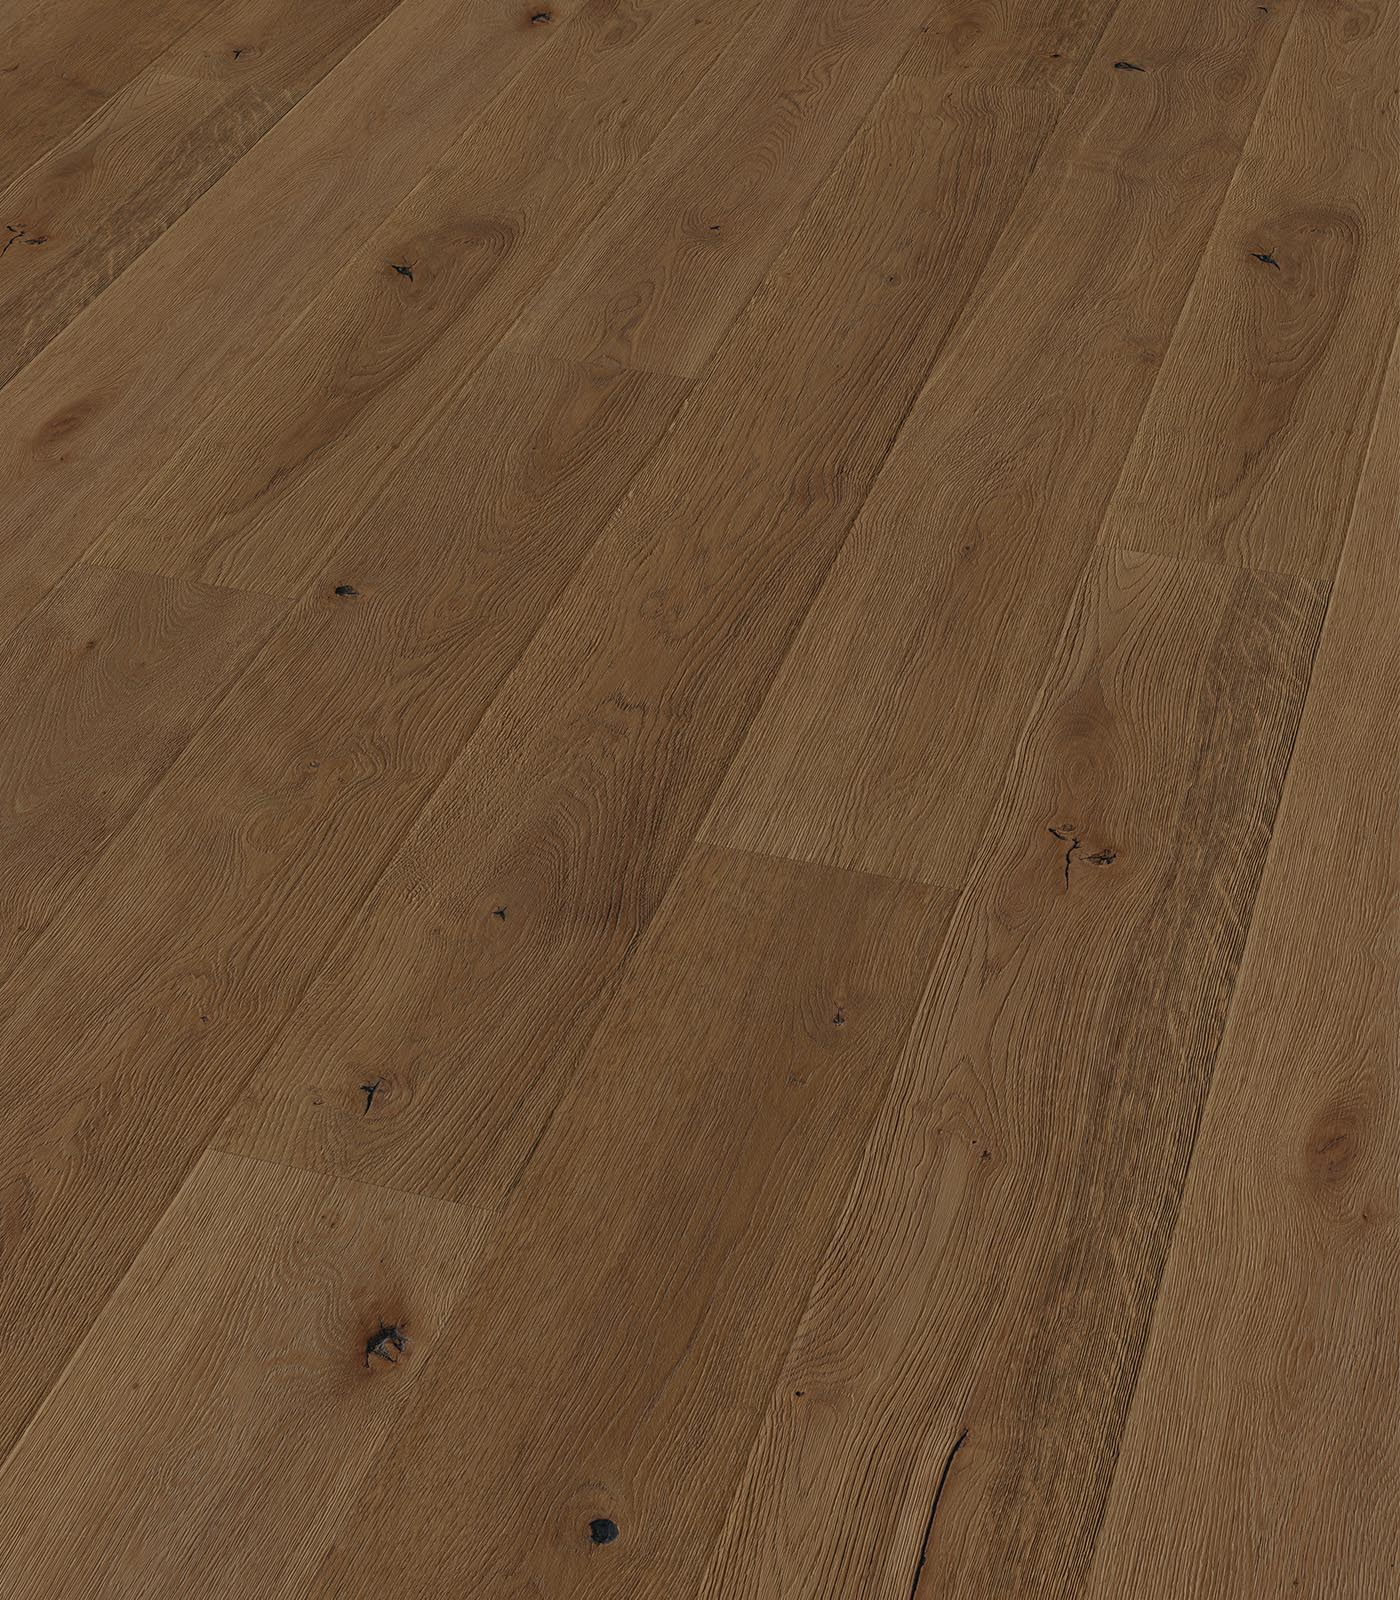 Oporto-Heritage Collection-European oak flooring-angle